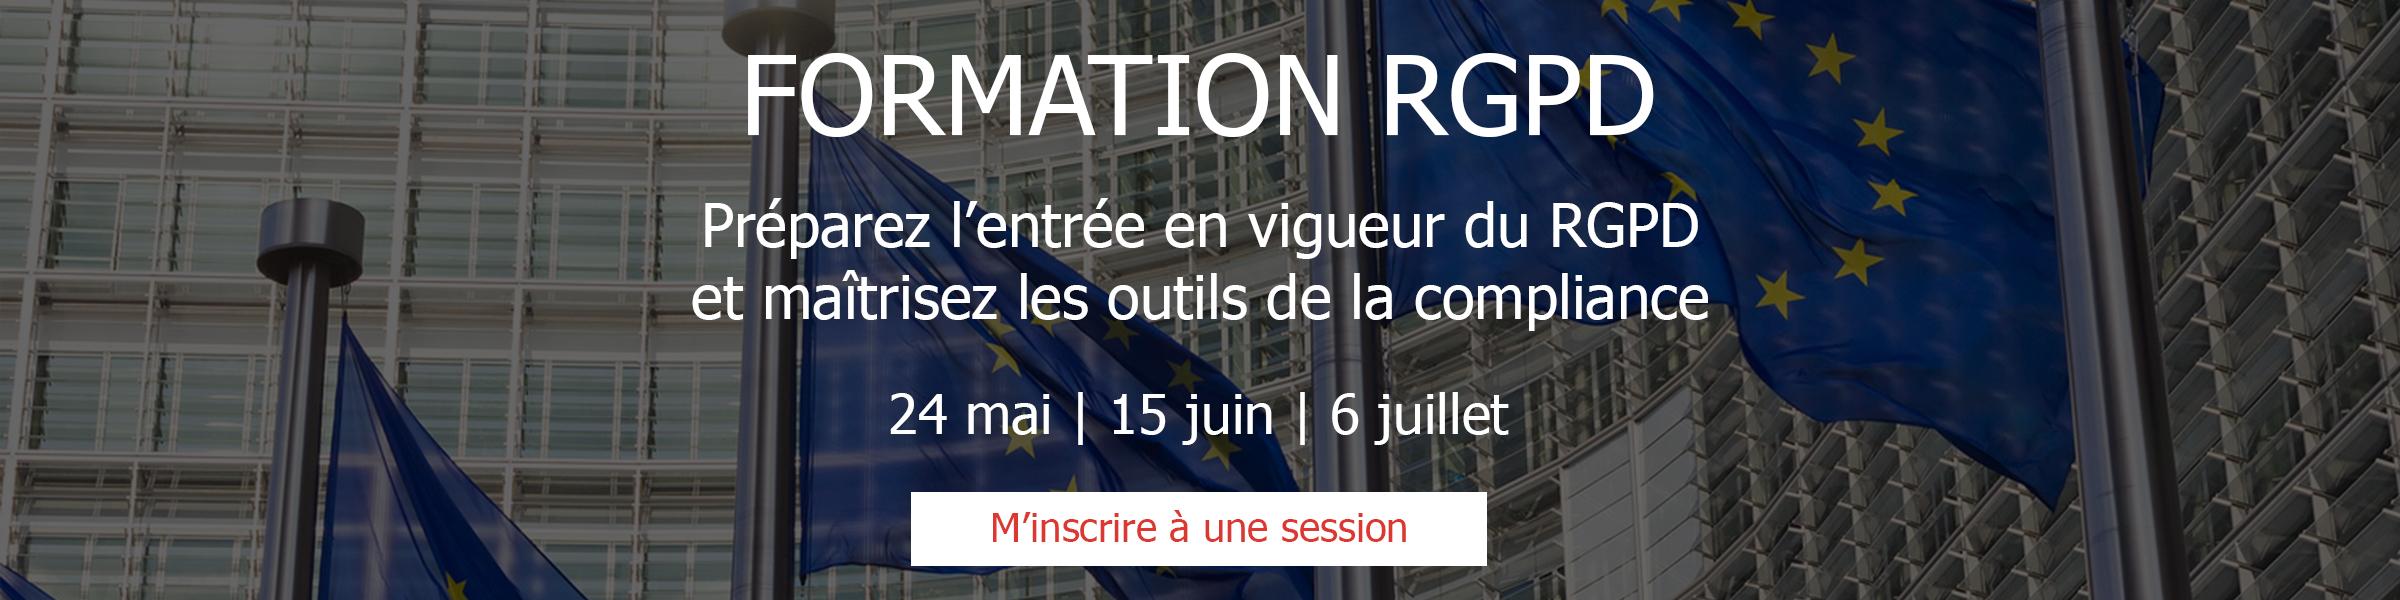 Bandeau formation RGPD mai juin juillet